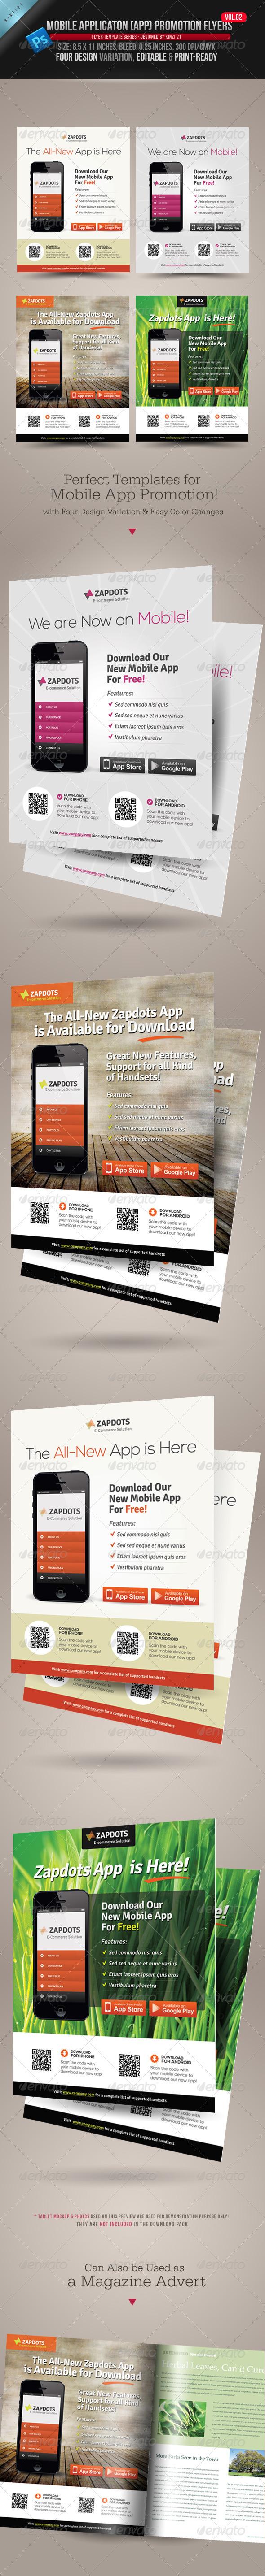 GraphicRiver Mobile App Promotion Flyers Vol.02 4024421